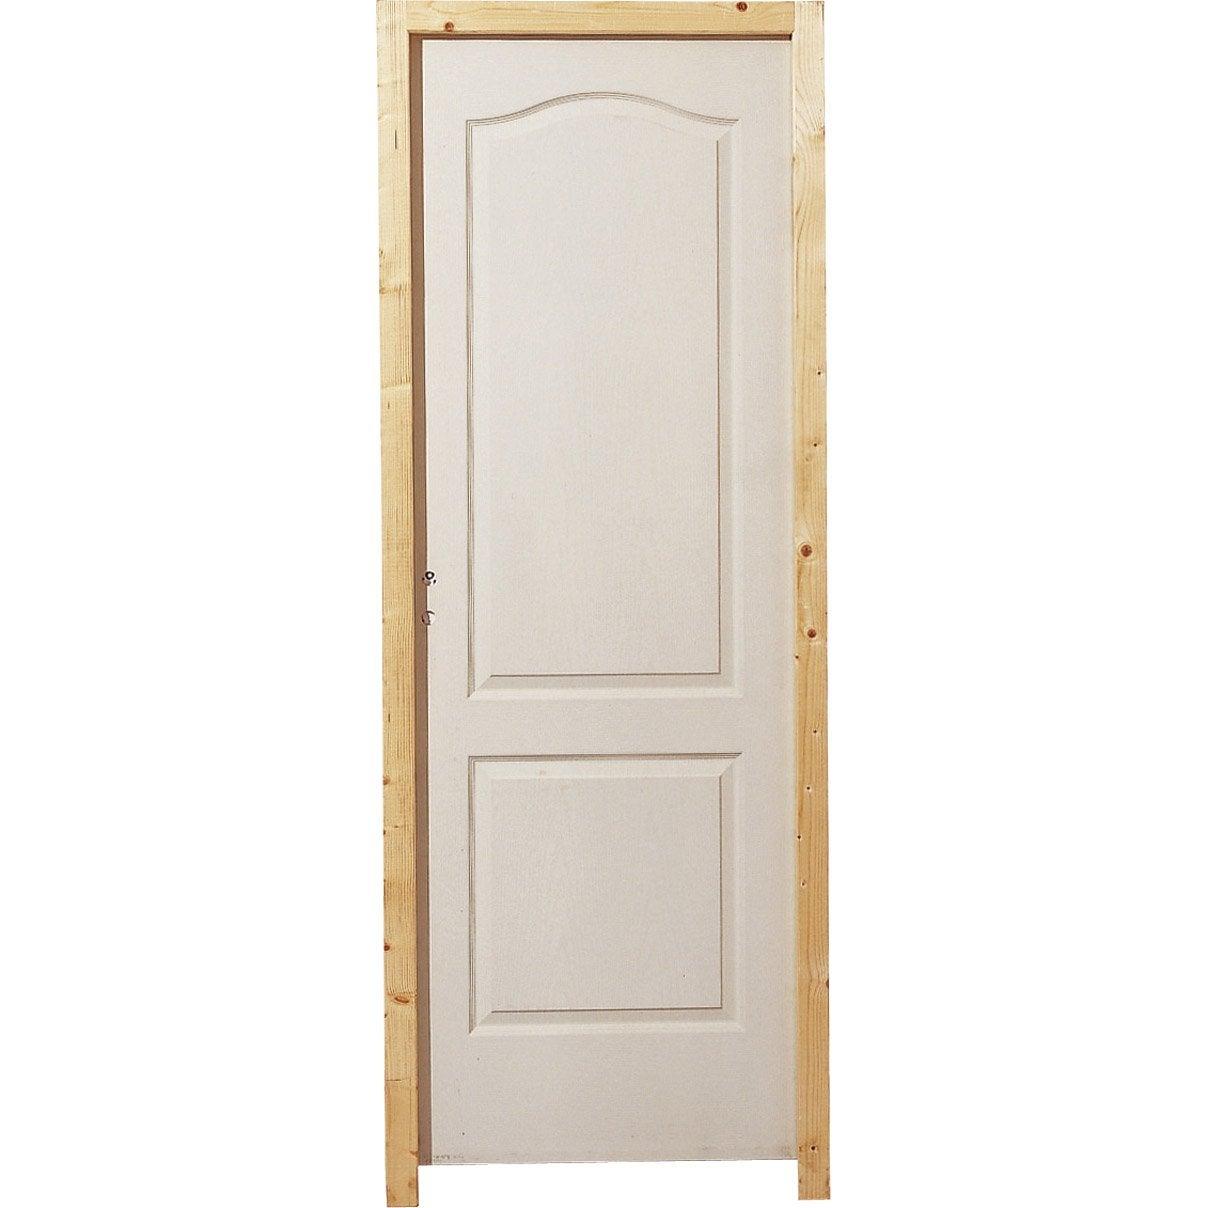 leroy merlin peinture bois interieur. Black Bedroom Furniture Sets. Home Design Ideas